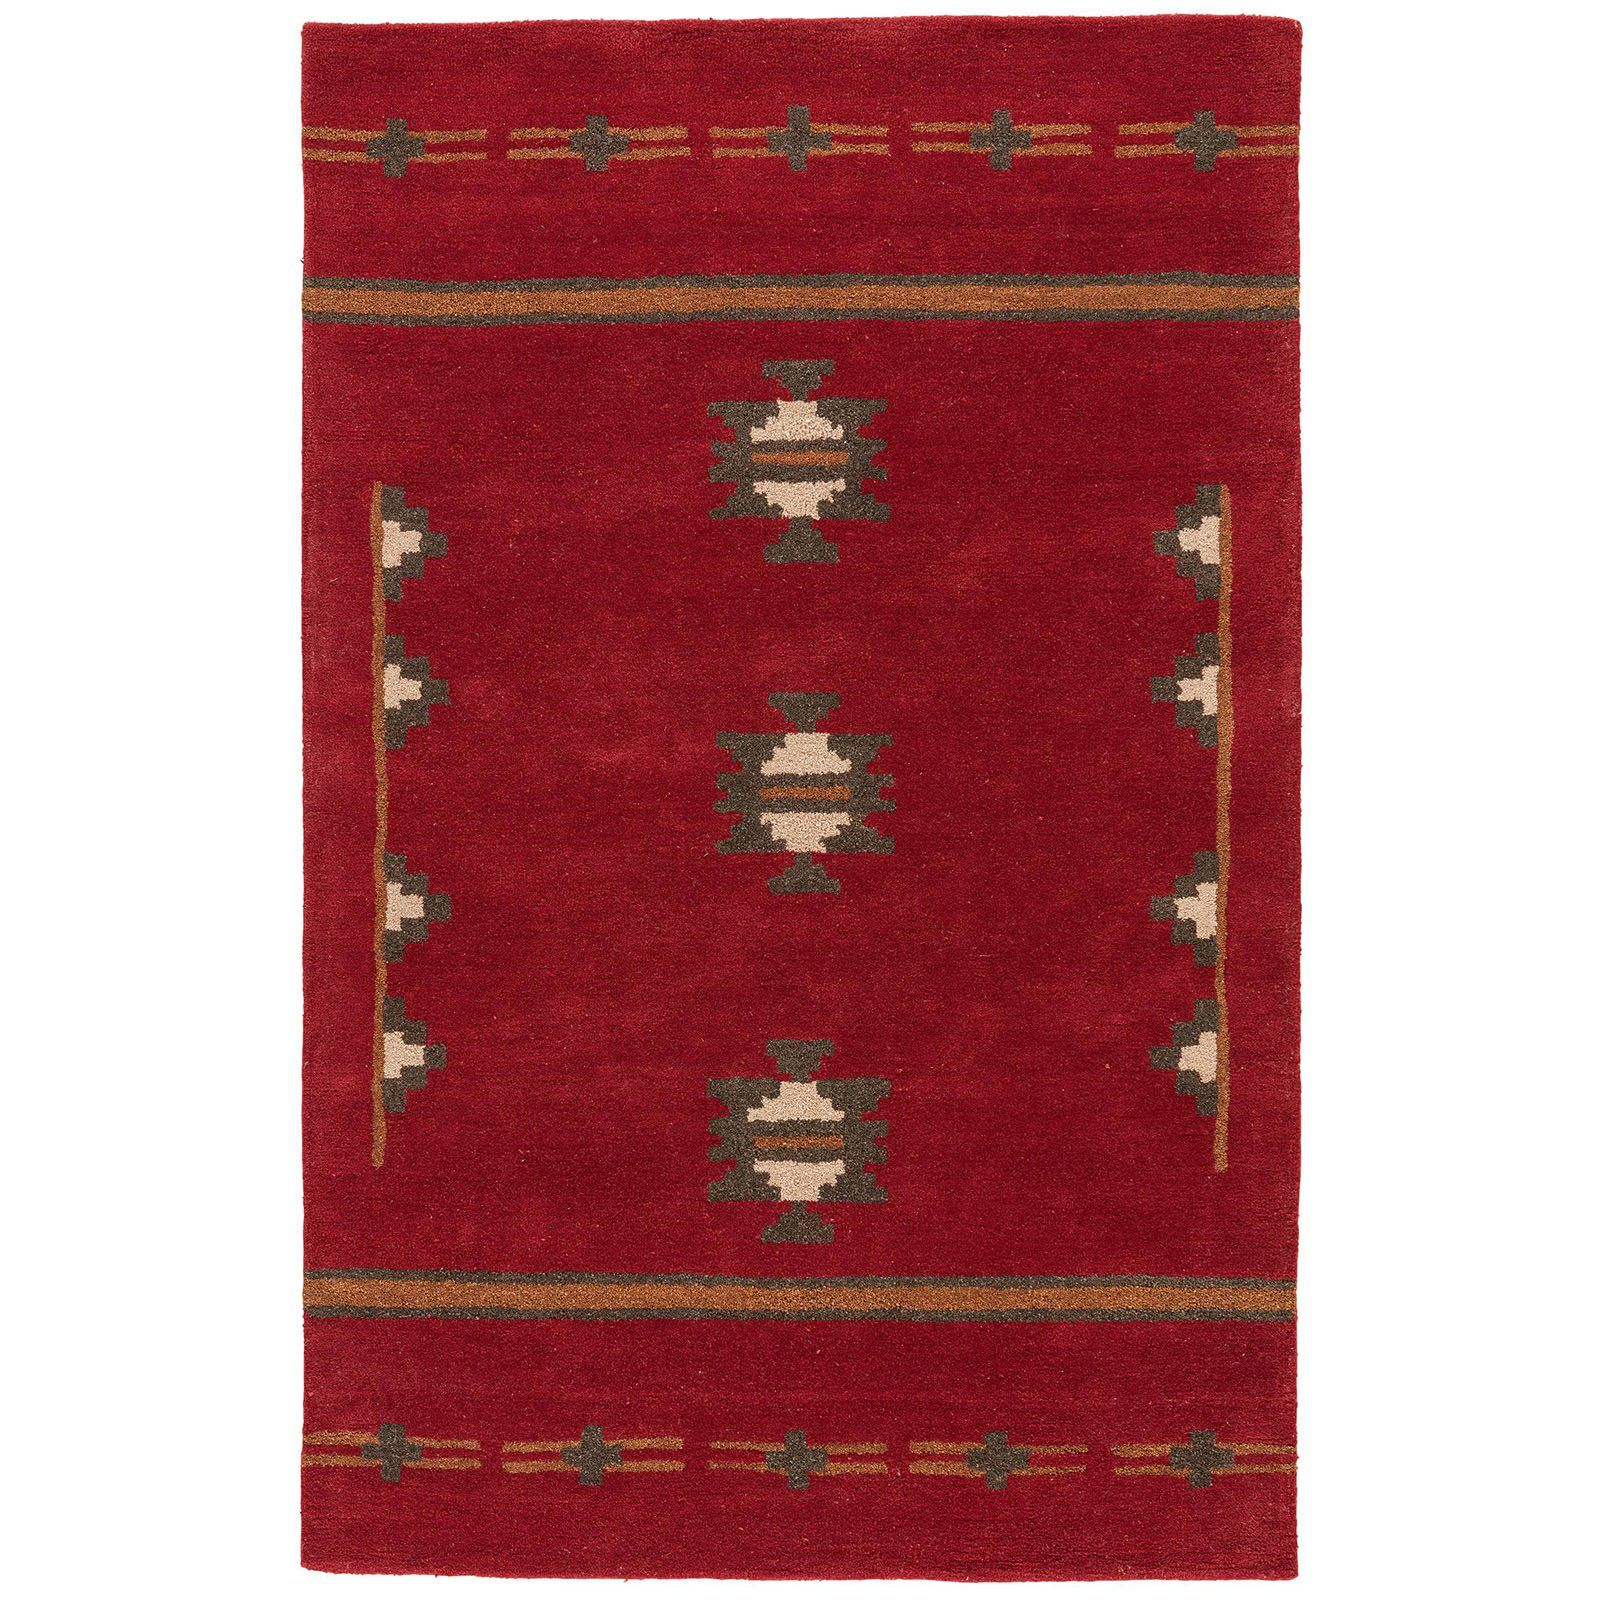 Jaipur Rugs Cabin Southwestern Indoor Area Rug Red Ochre Jaipur Rugs Wool Area Rugs Rugs